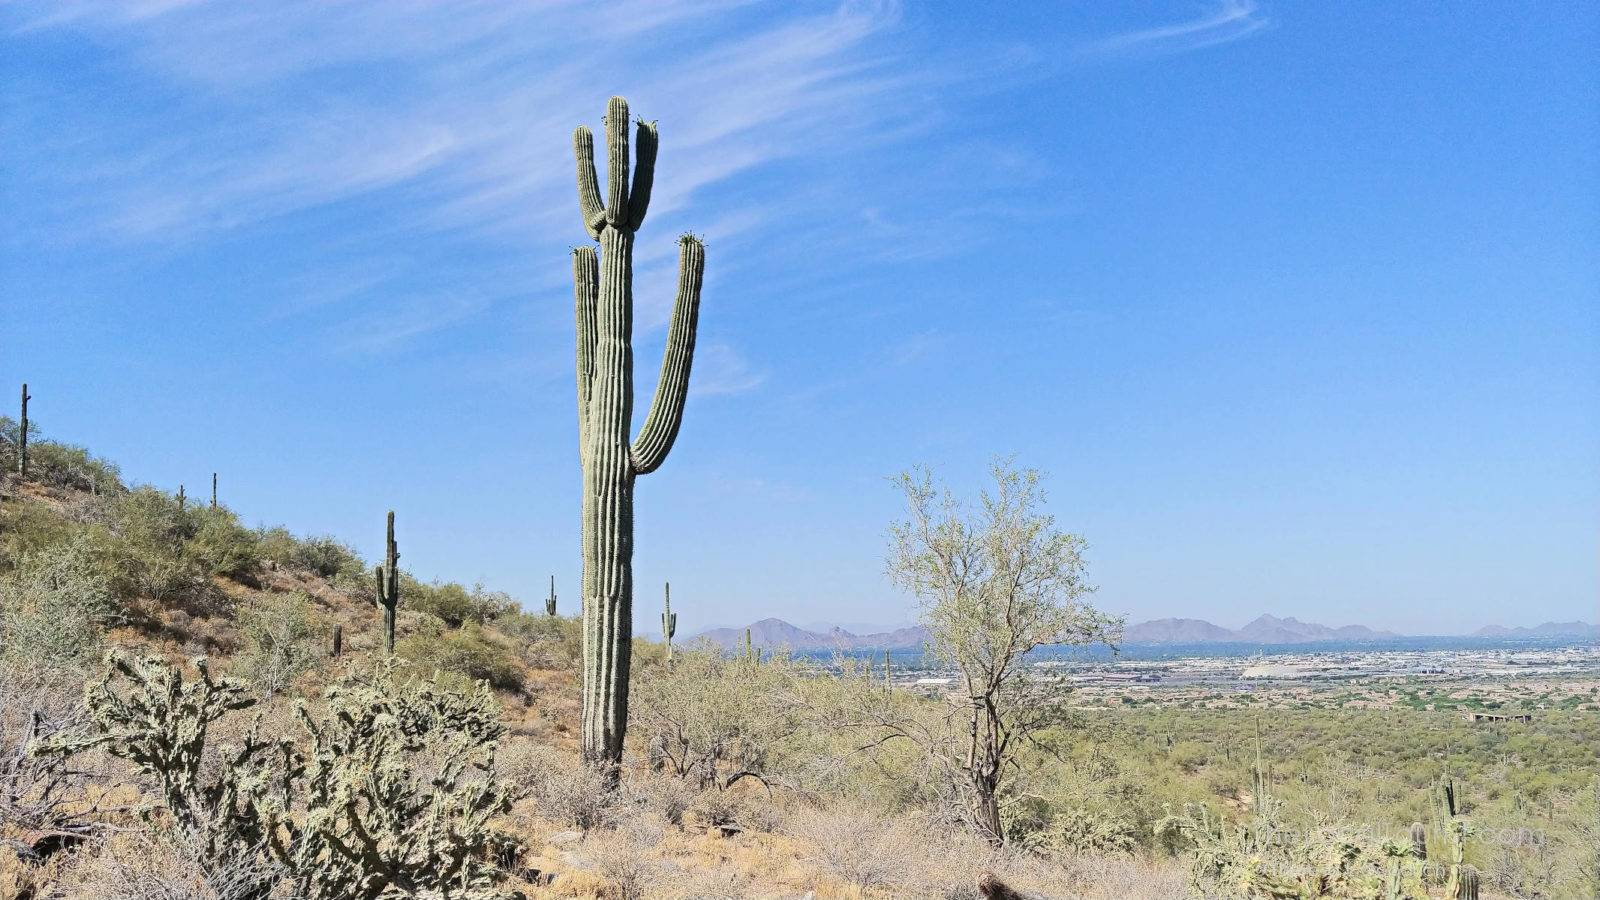 Saguaro cactus overlooking Scottsdale Arizona